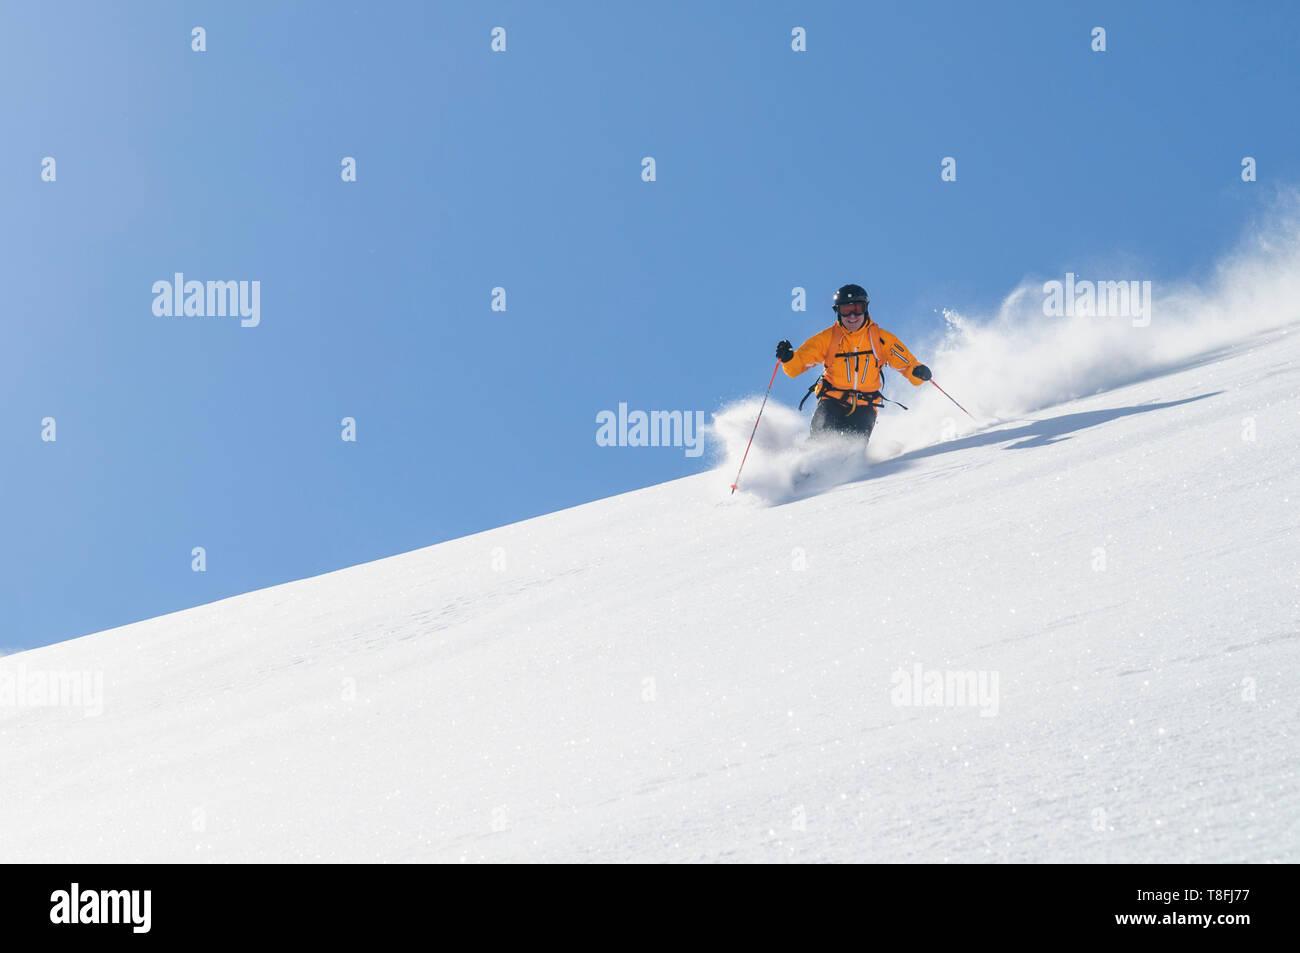 Expert skier on Monte Rosa glaciers in impressive high alpine nature - Stock Image